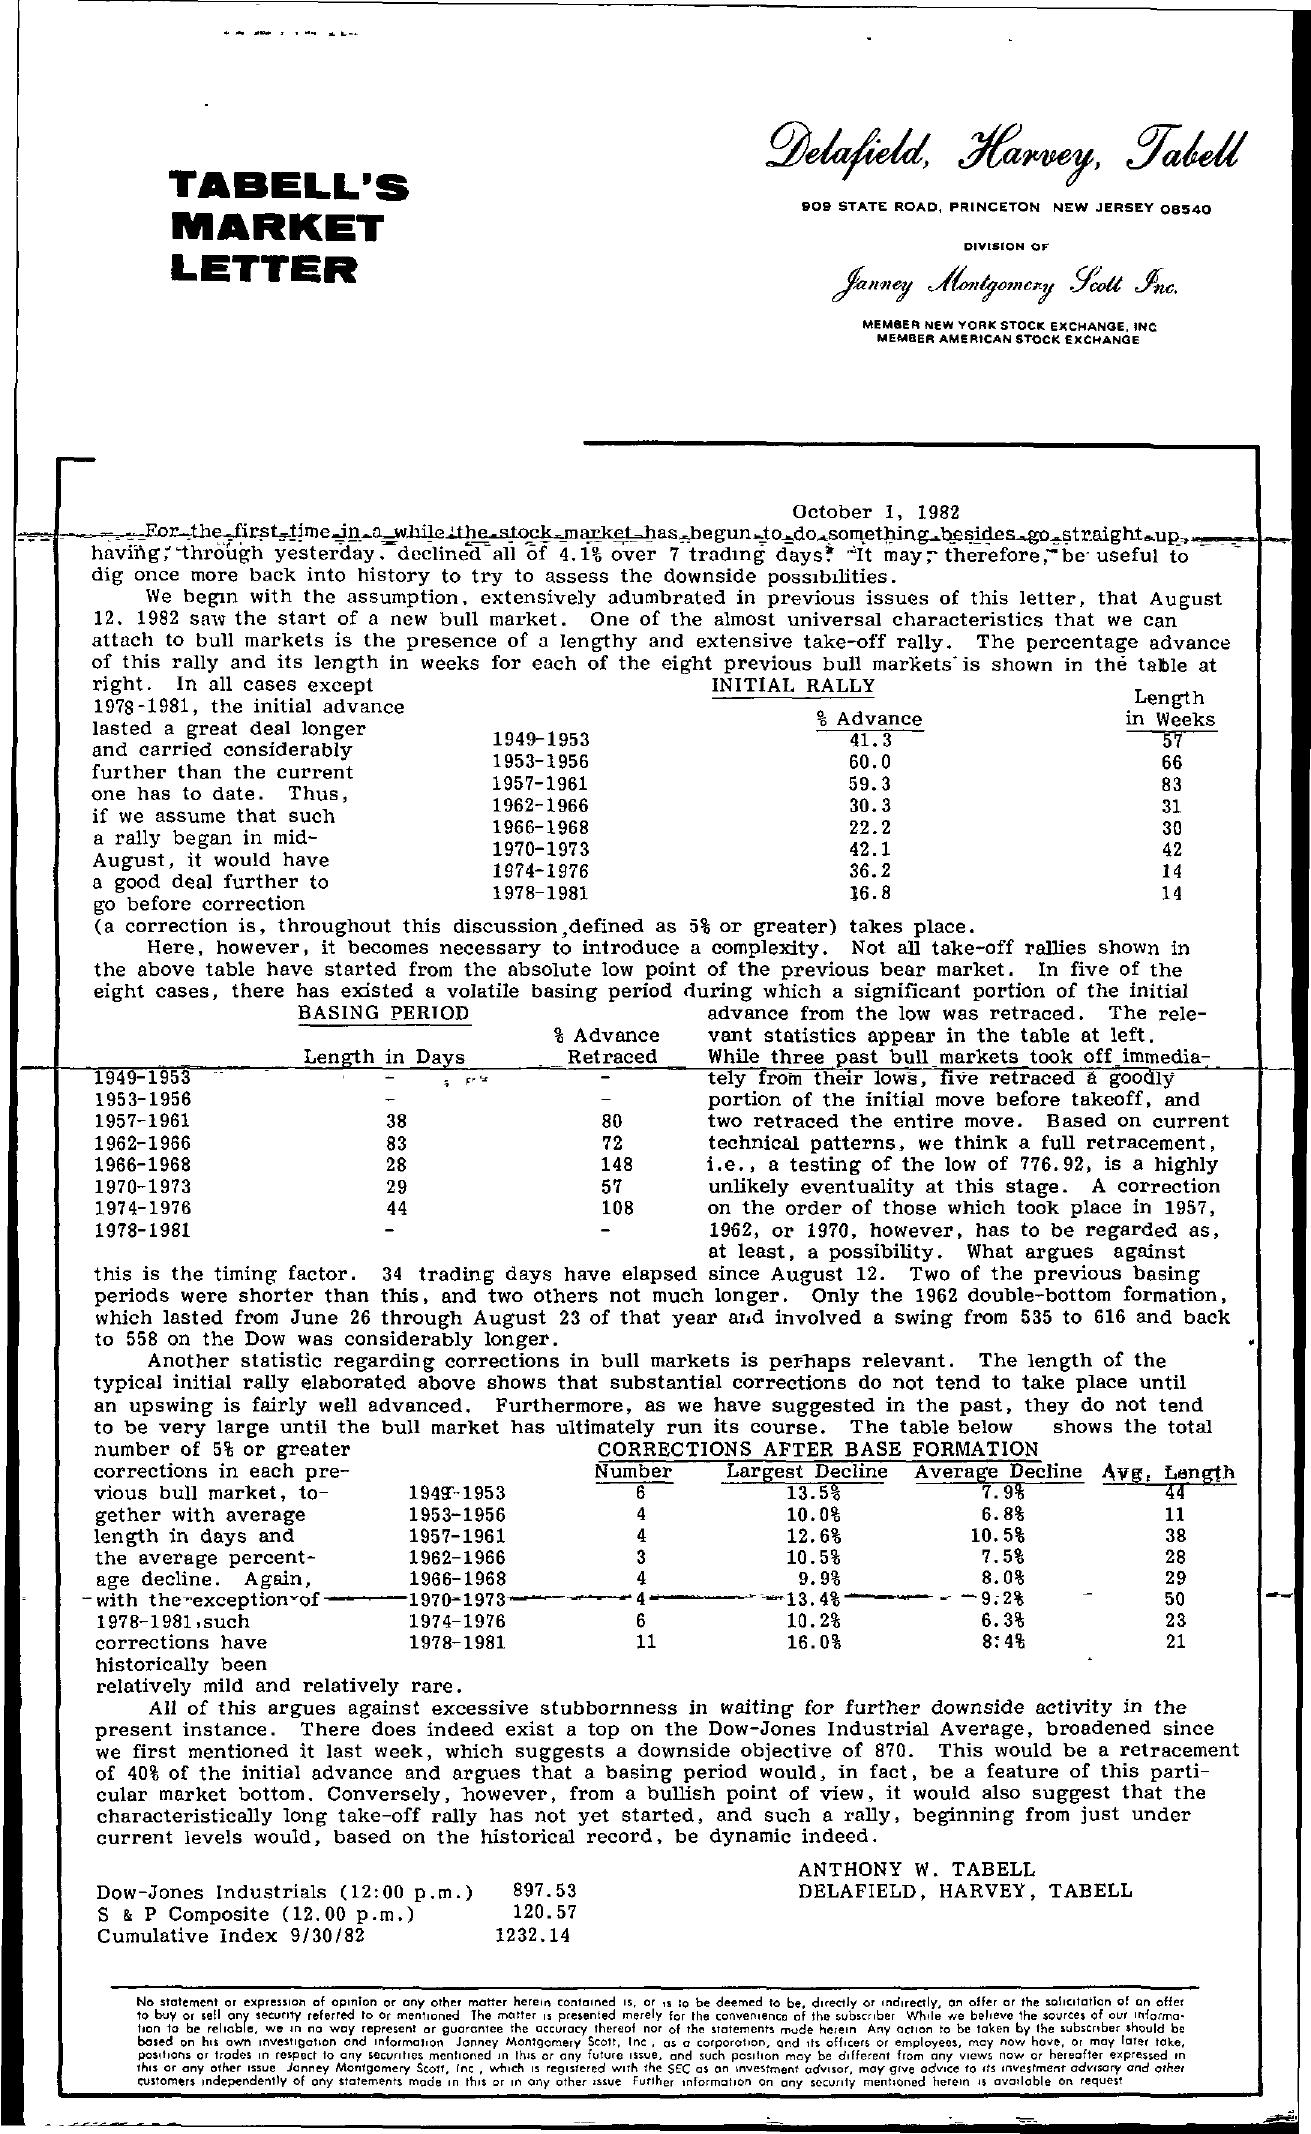 Tabell's Market Letter - October 01, 1982